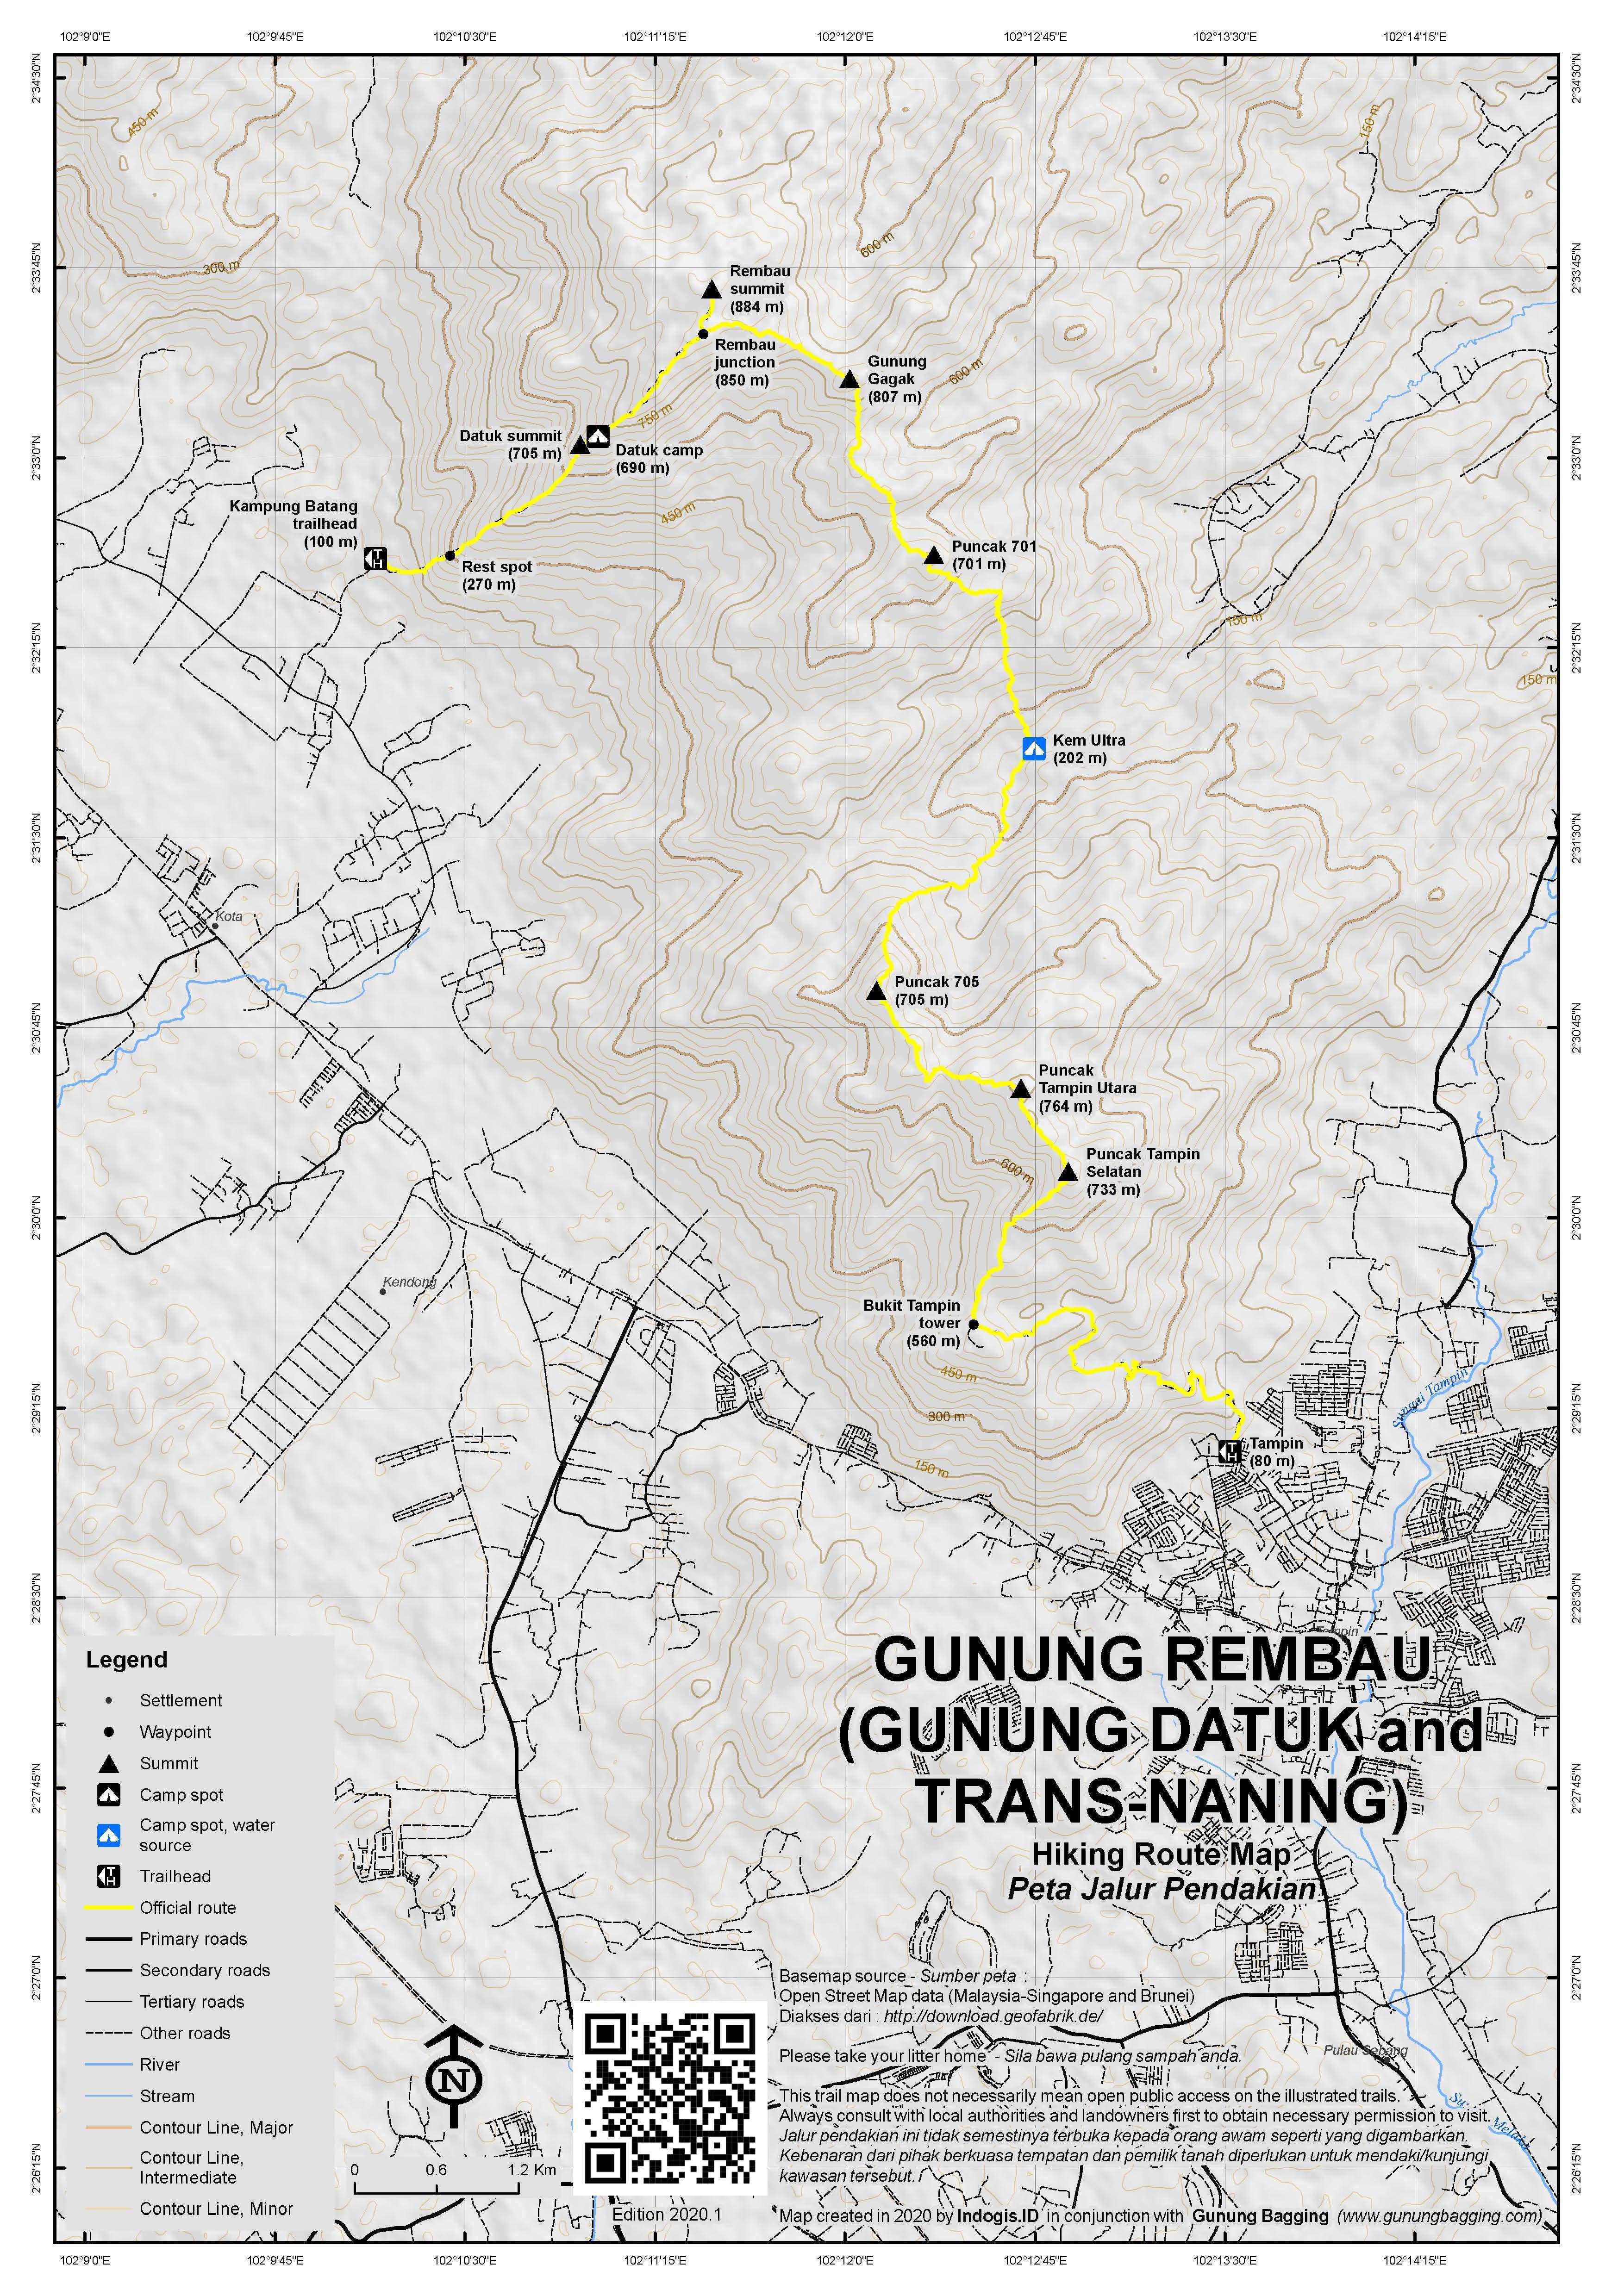 Peta Jalur Pendakian Gunung Rembau